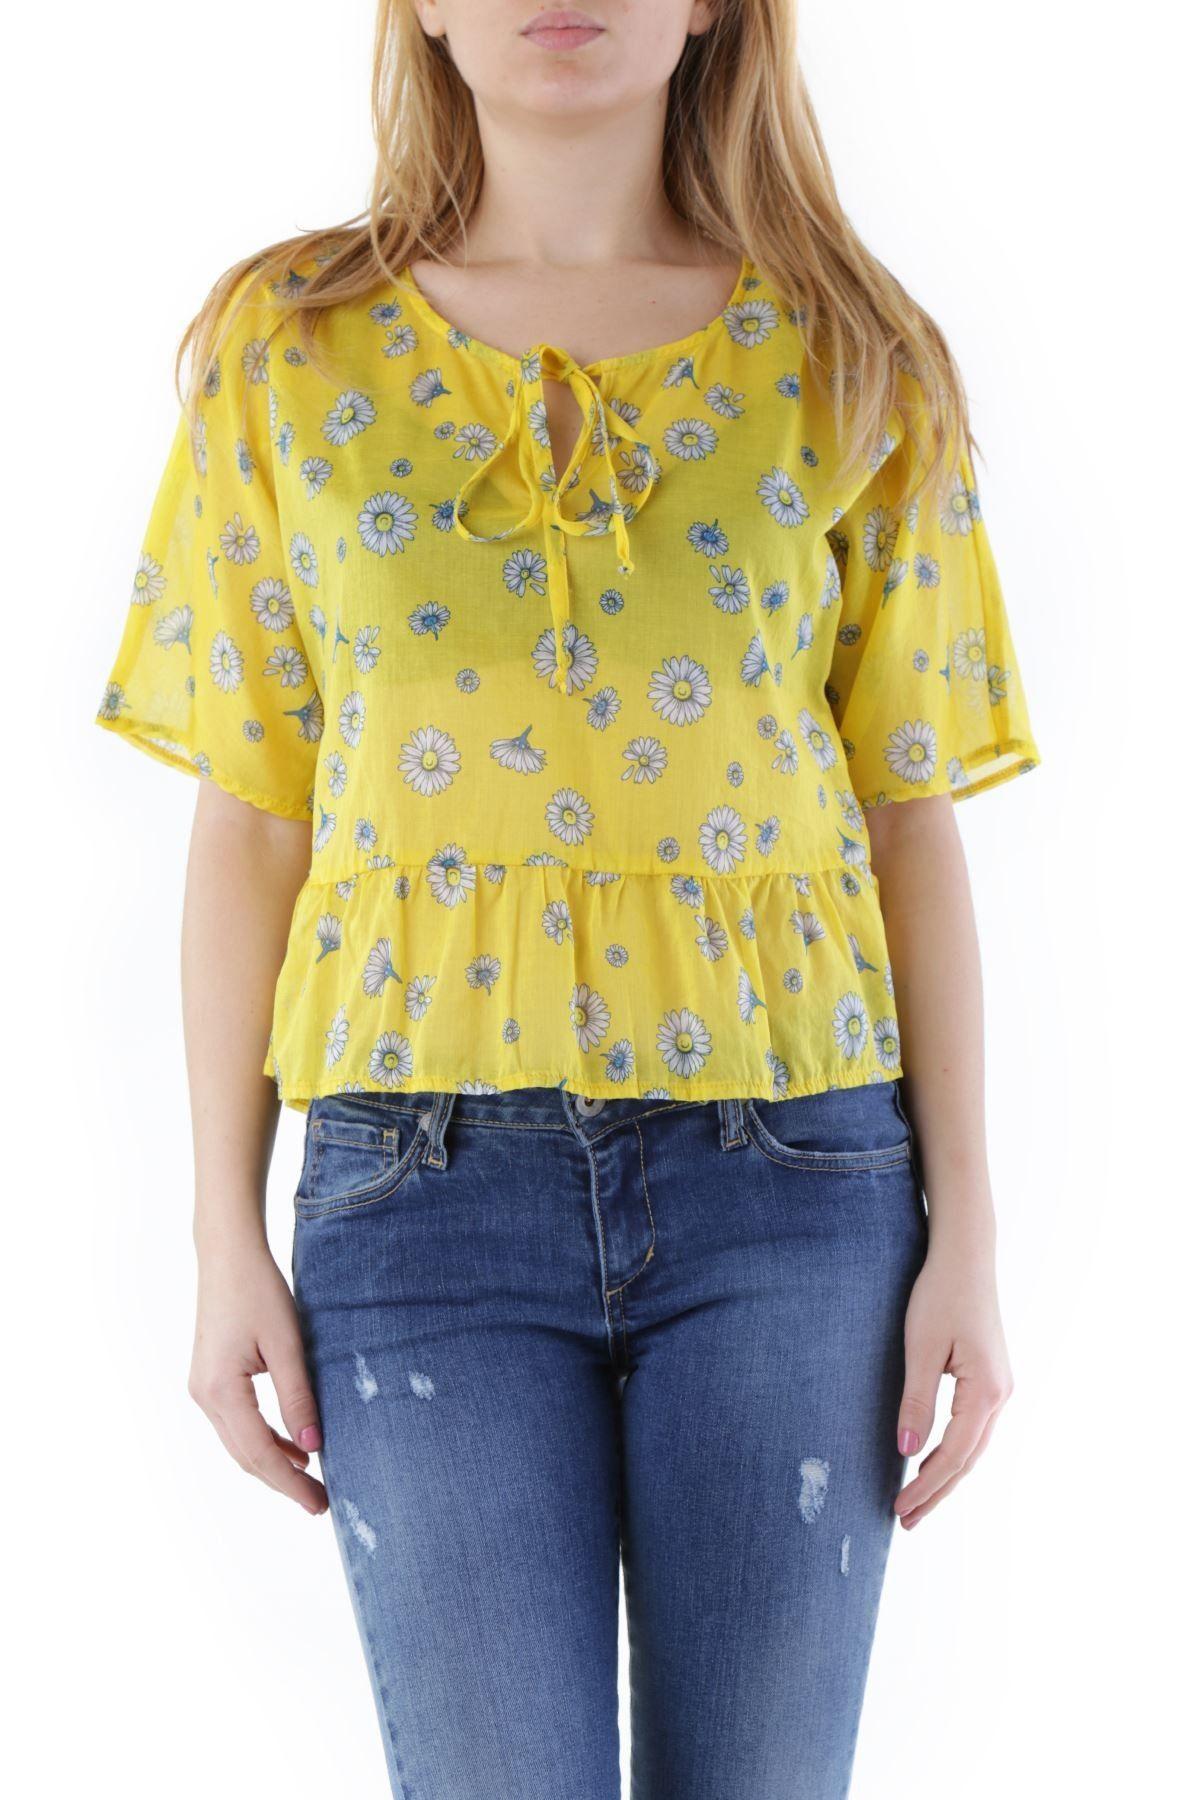 Olivia Hops Women's Blouse In Yellow